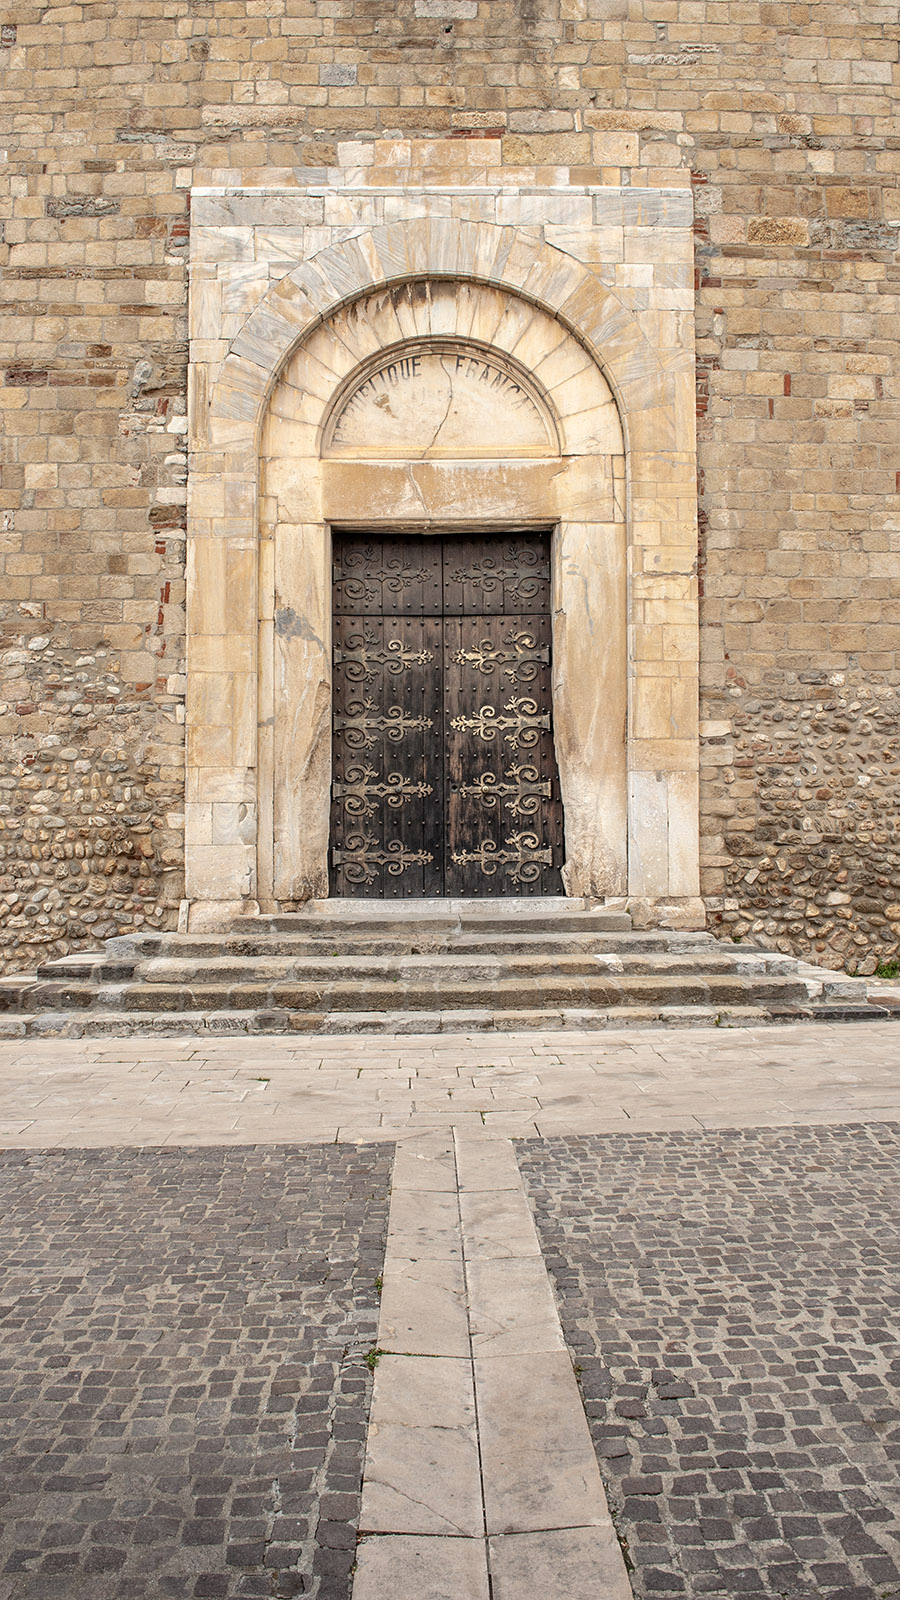 Elne: Die Kathedrale Sainte-Eulalie-et-Sainte-Julie. Foto: Hilke Maunder